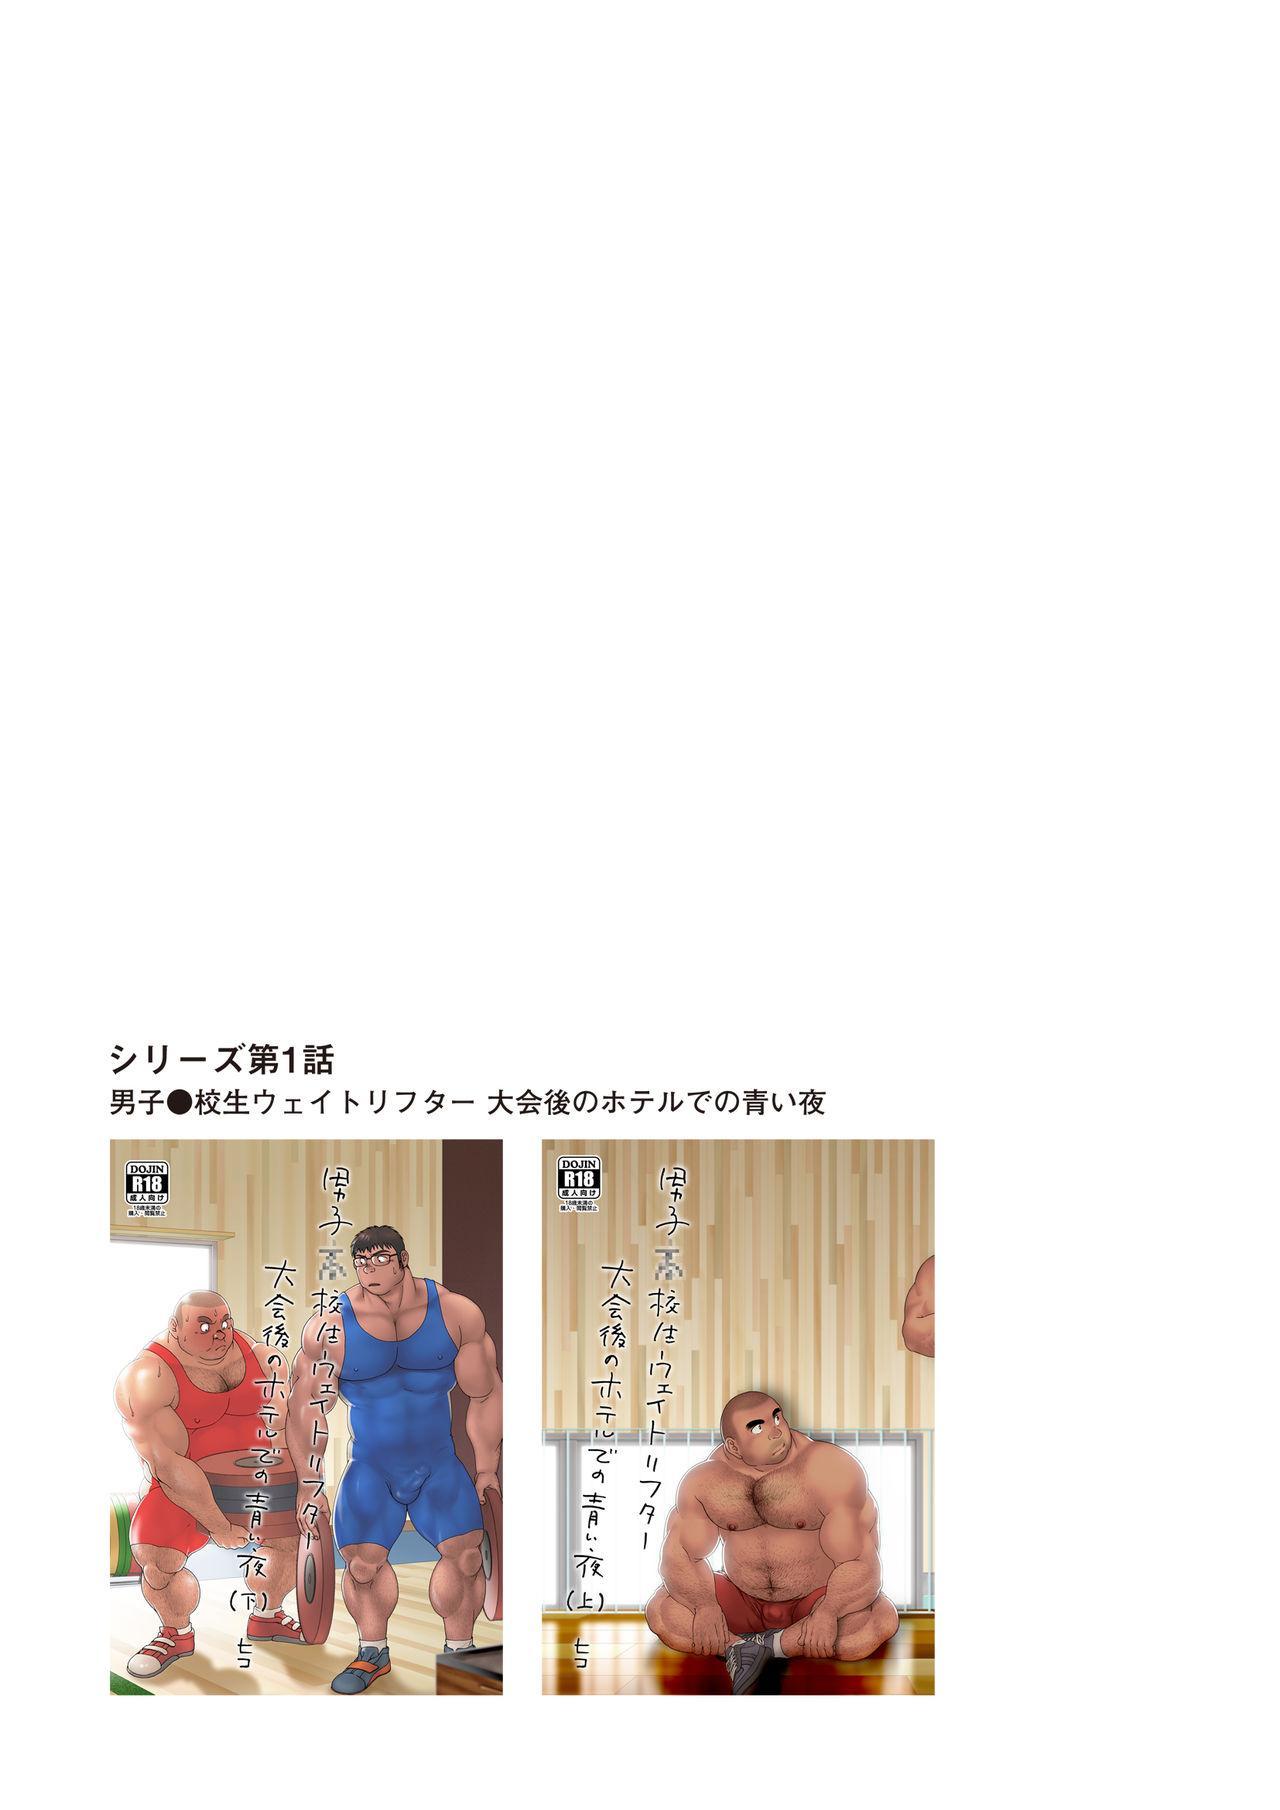 Danshi Koukousei Weightlifter Shiai-chuu, Osae kirenai Wakai Takeri 57